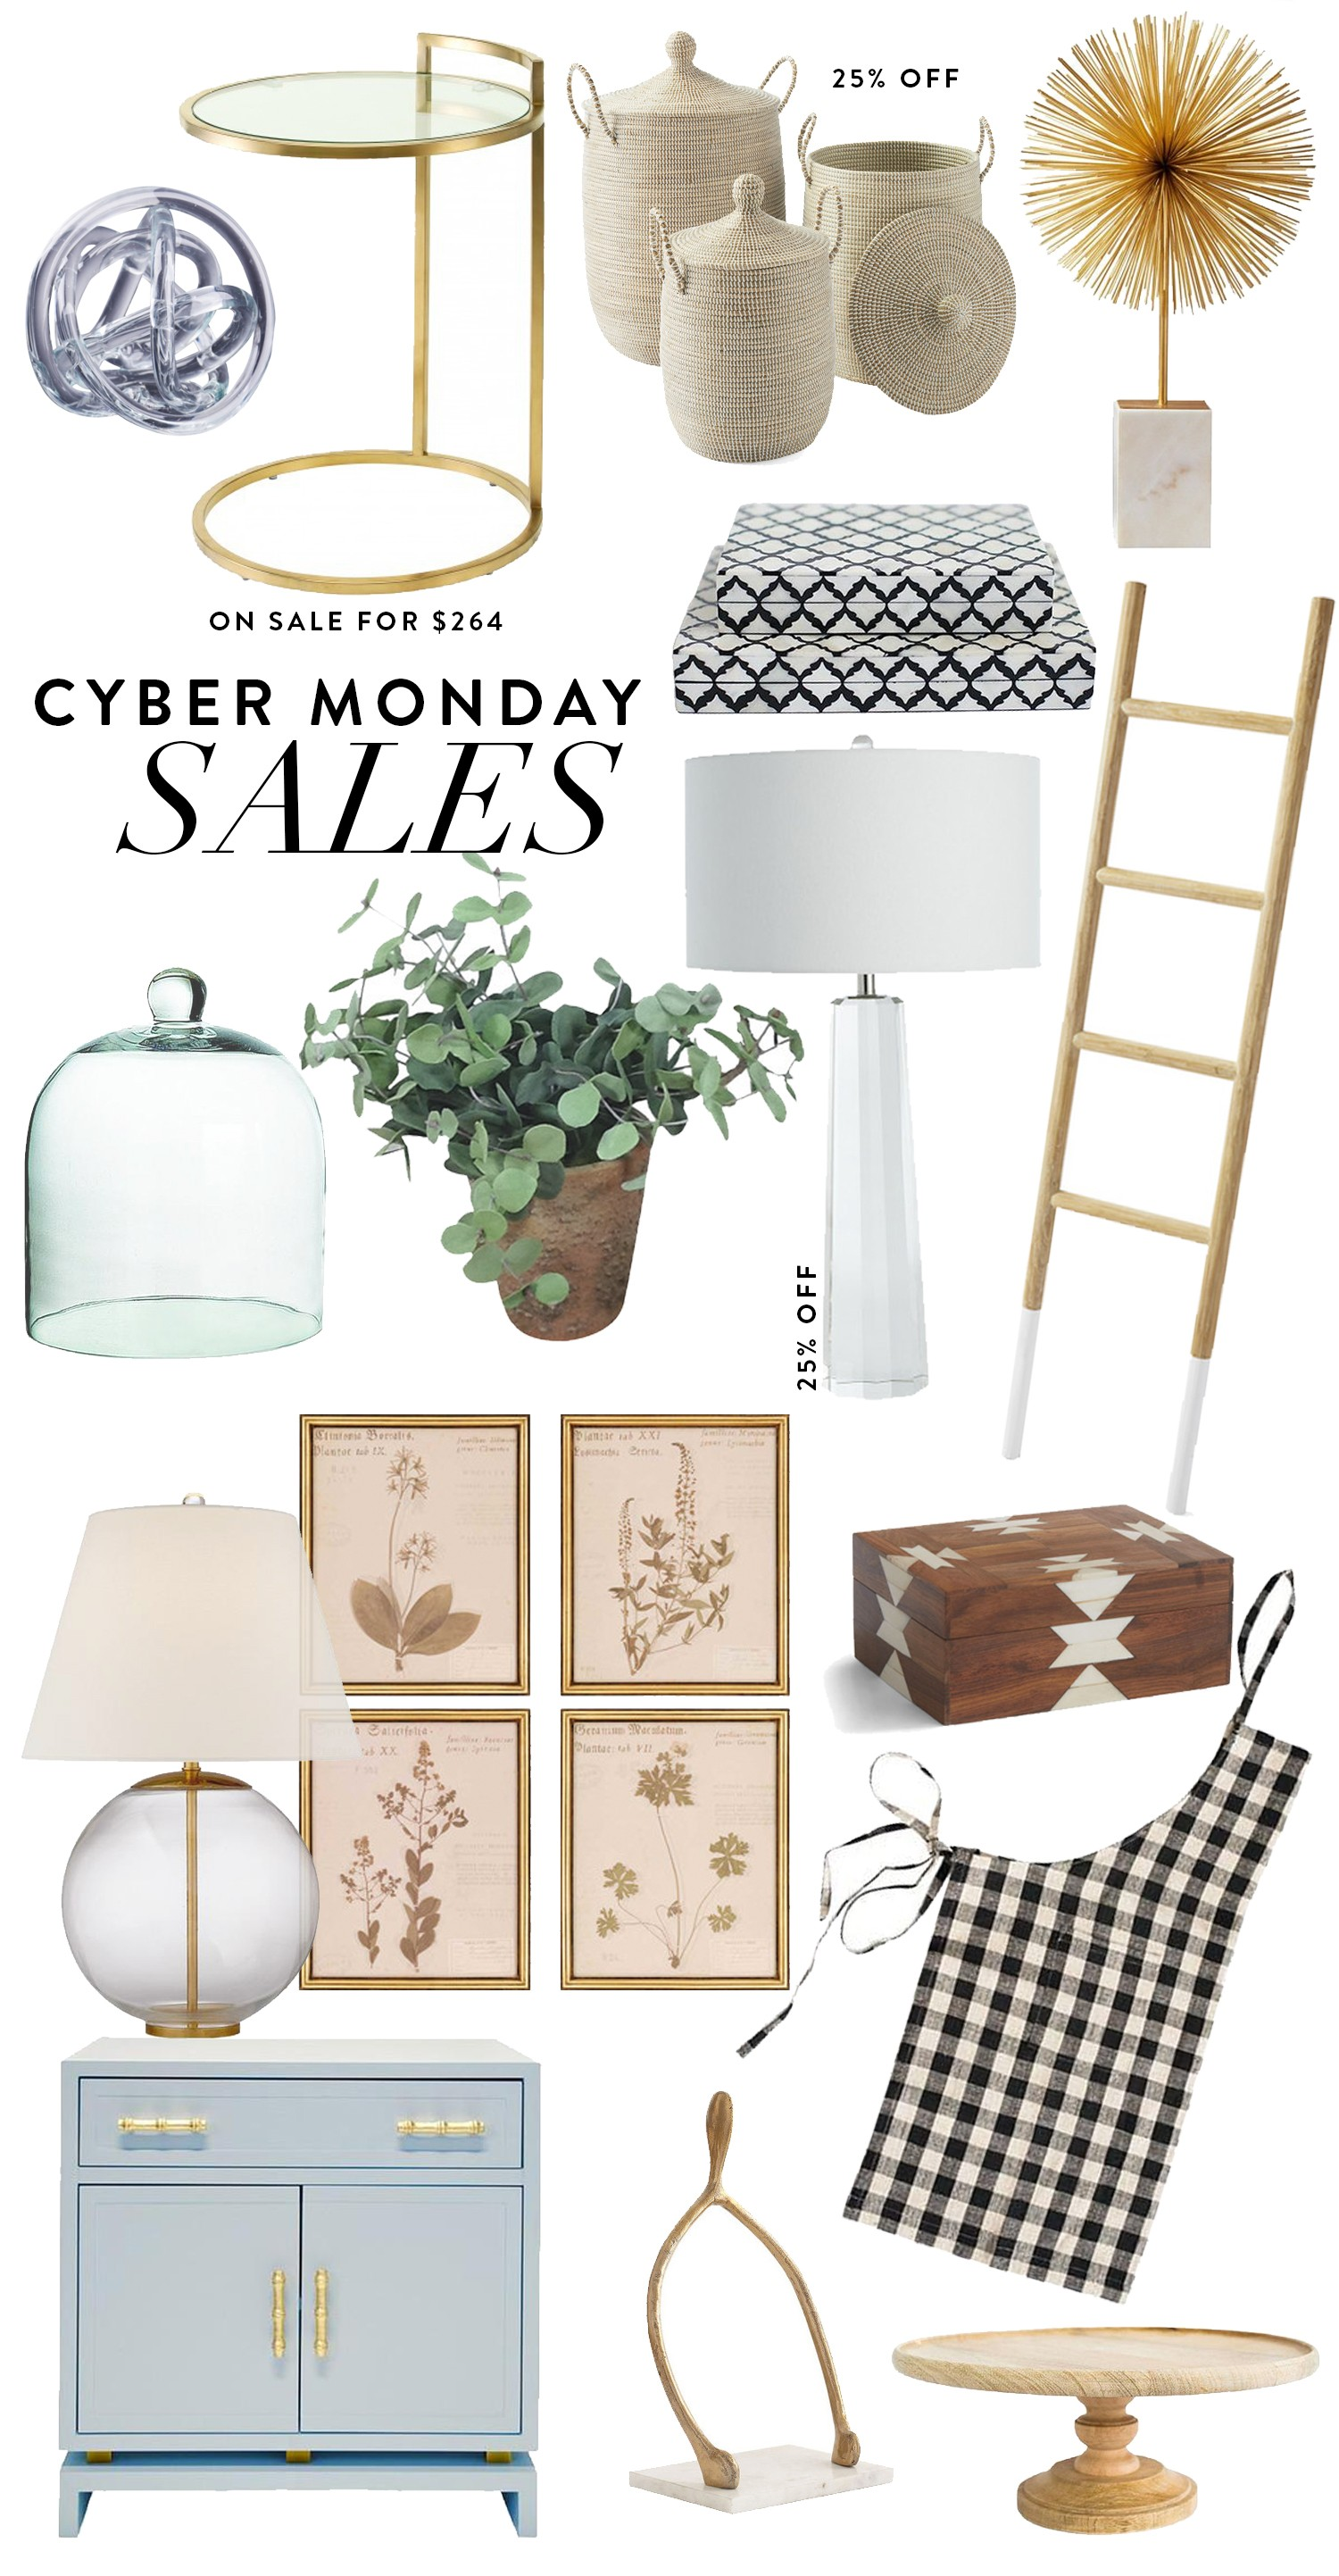 Cyber Monday Home Decor Deals